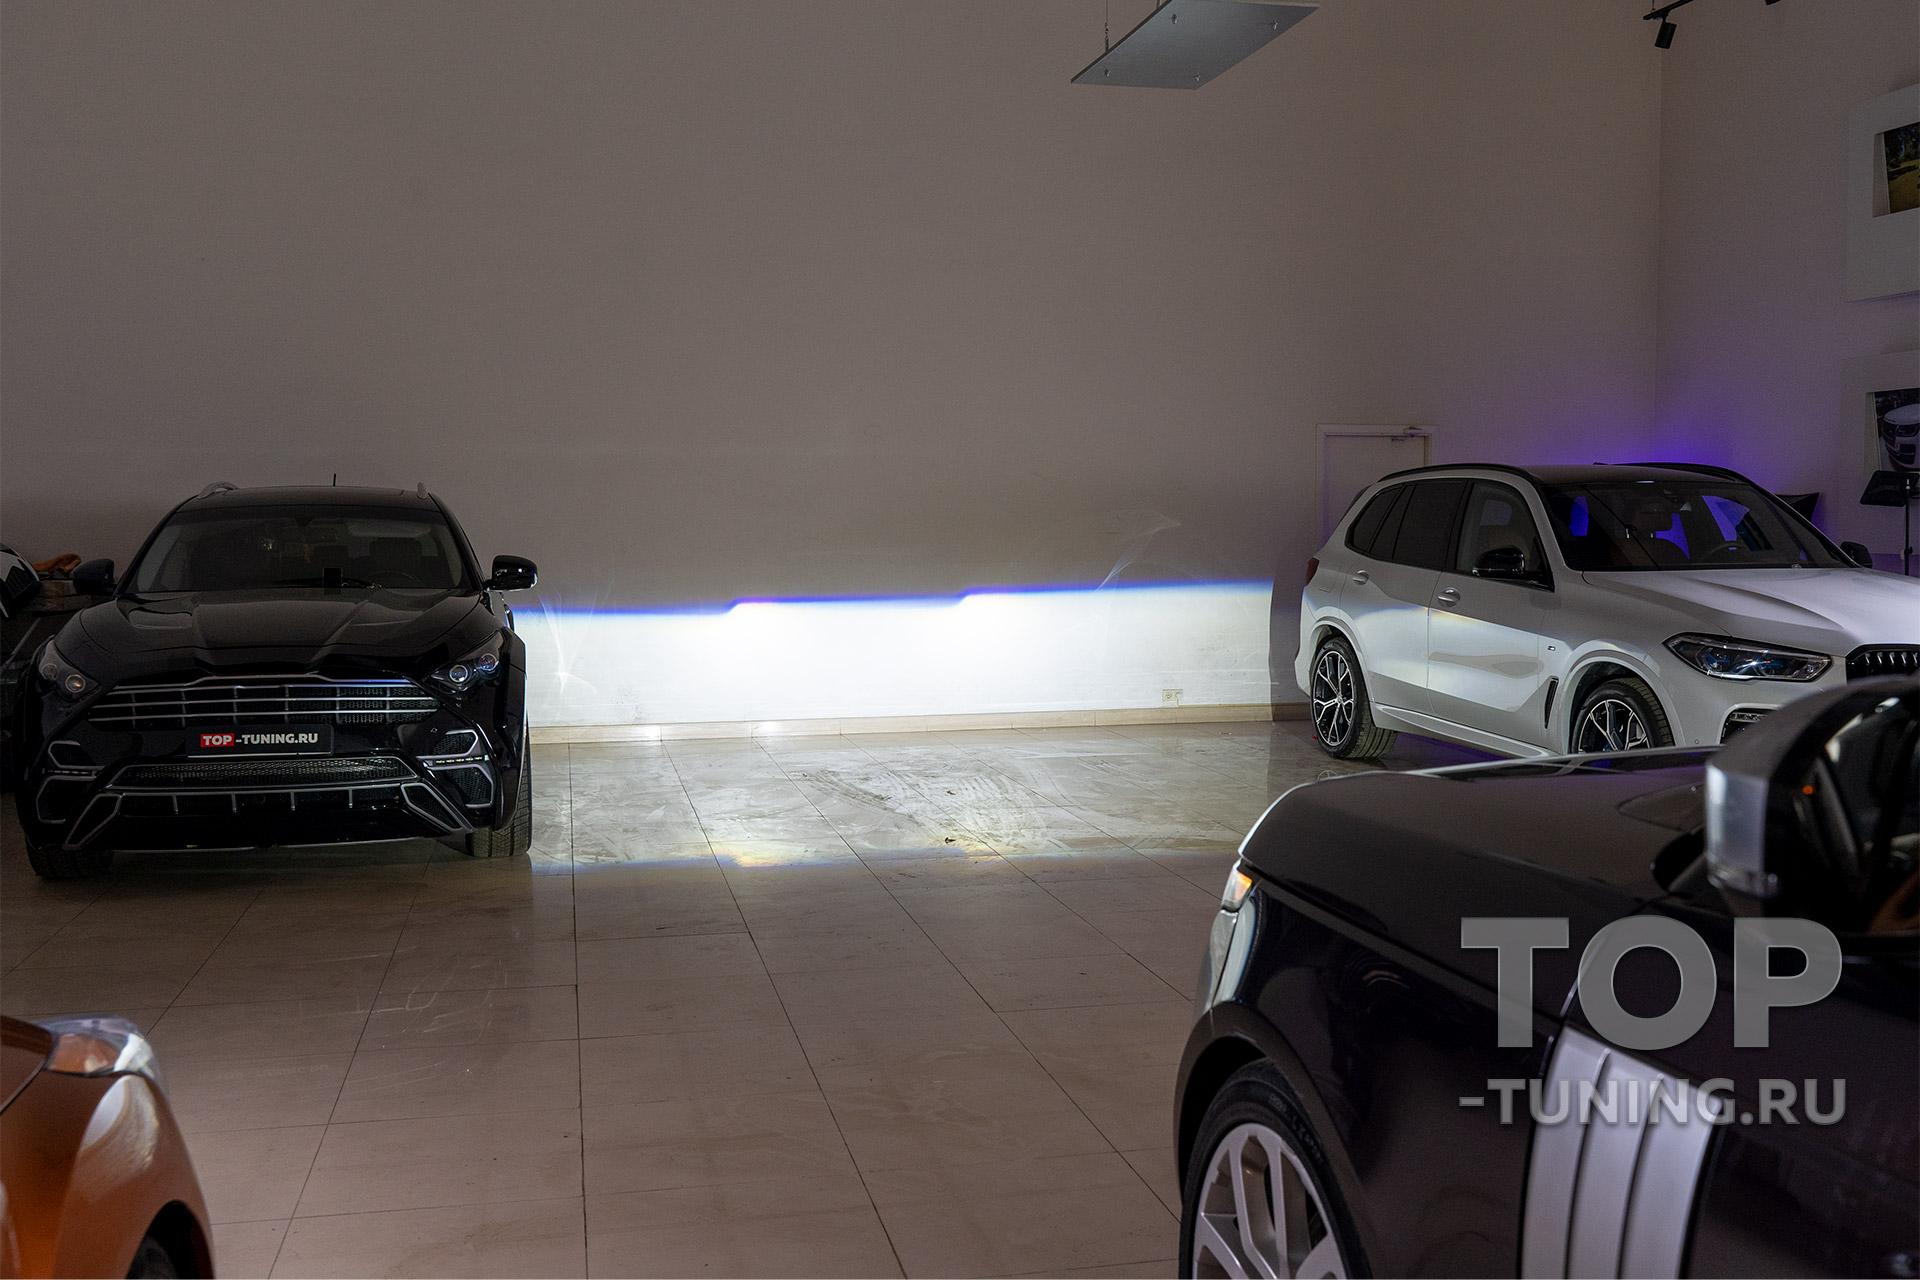 Range Rover Vogue SE 4 - Ближний свет, би лед с лазером